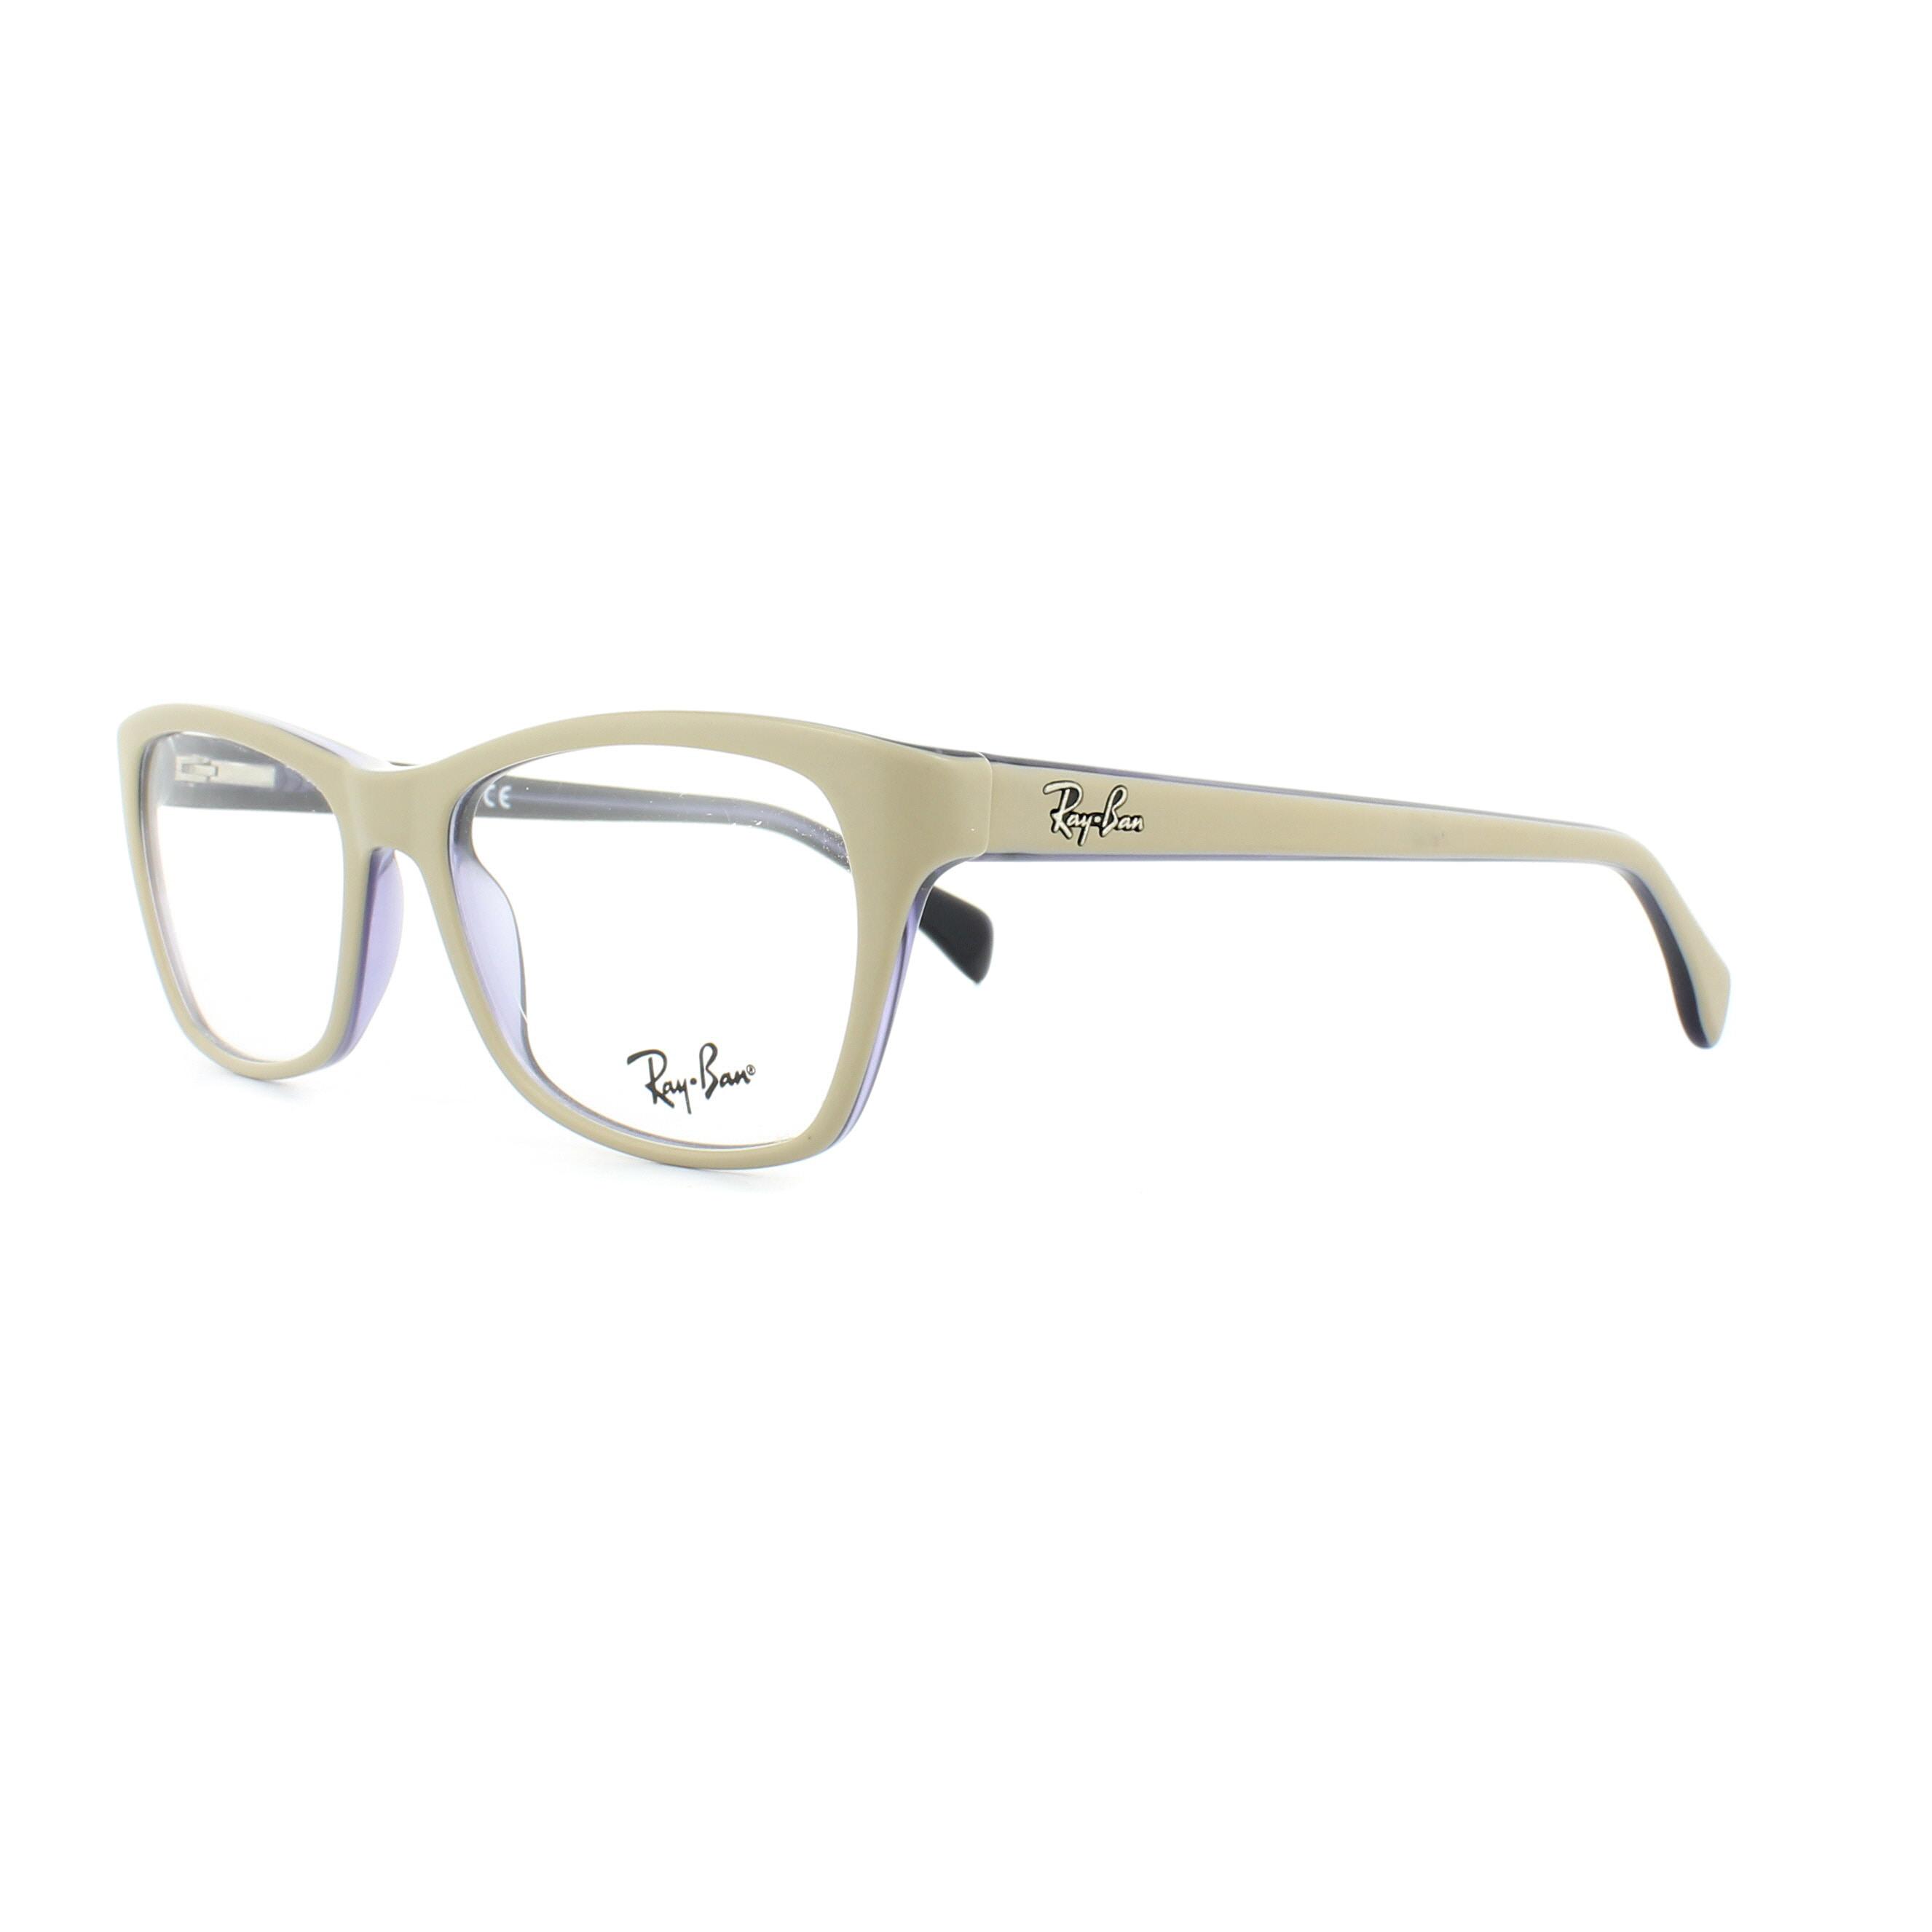 63a2f0b42a5 Sentinel Ray-Ban Glasses Frames 5298 5387 Matt Beige on Violet 53mm Womens